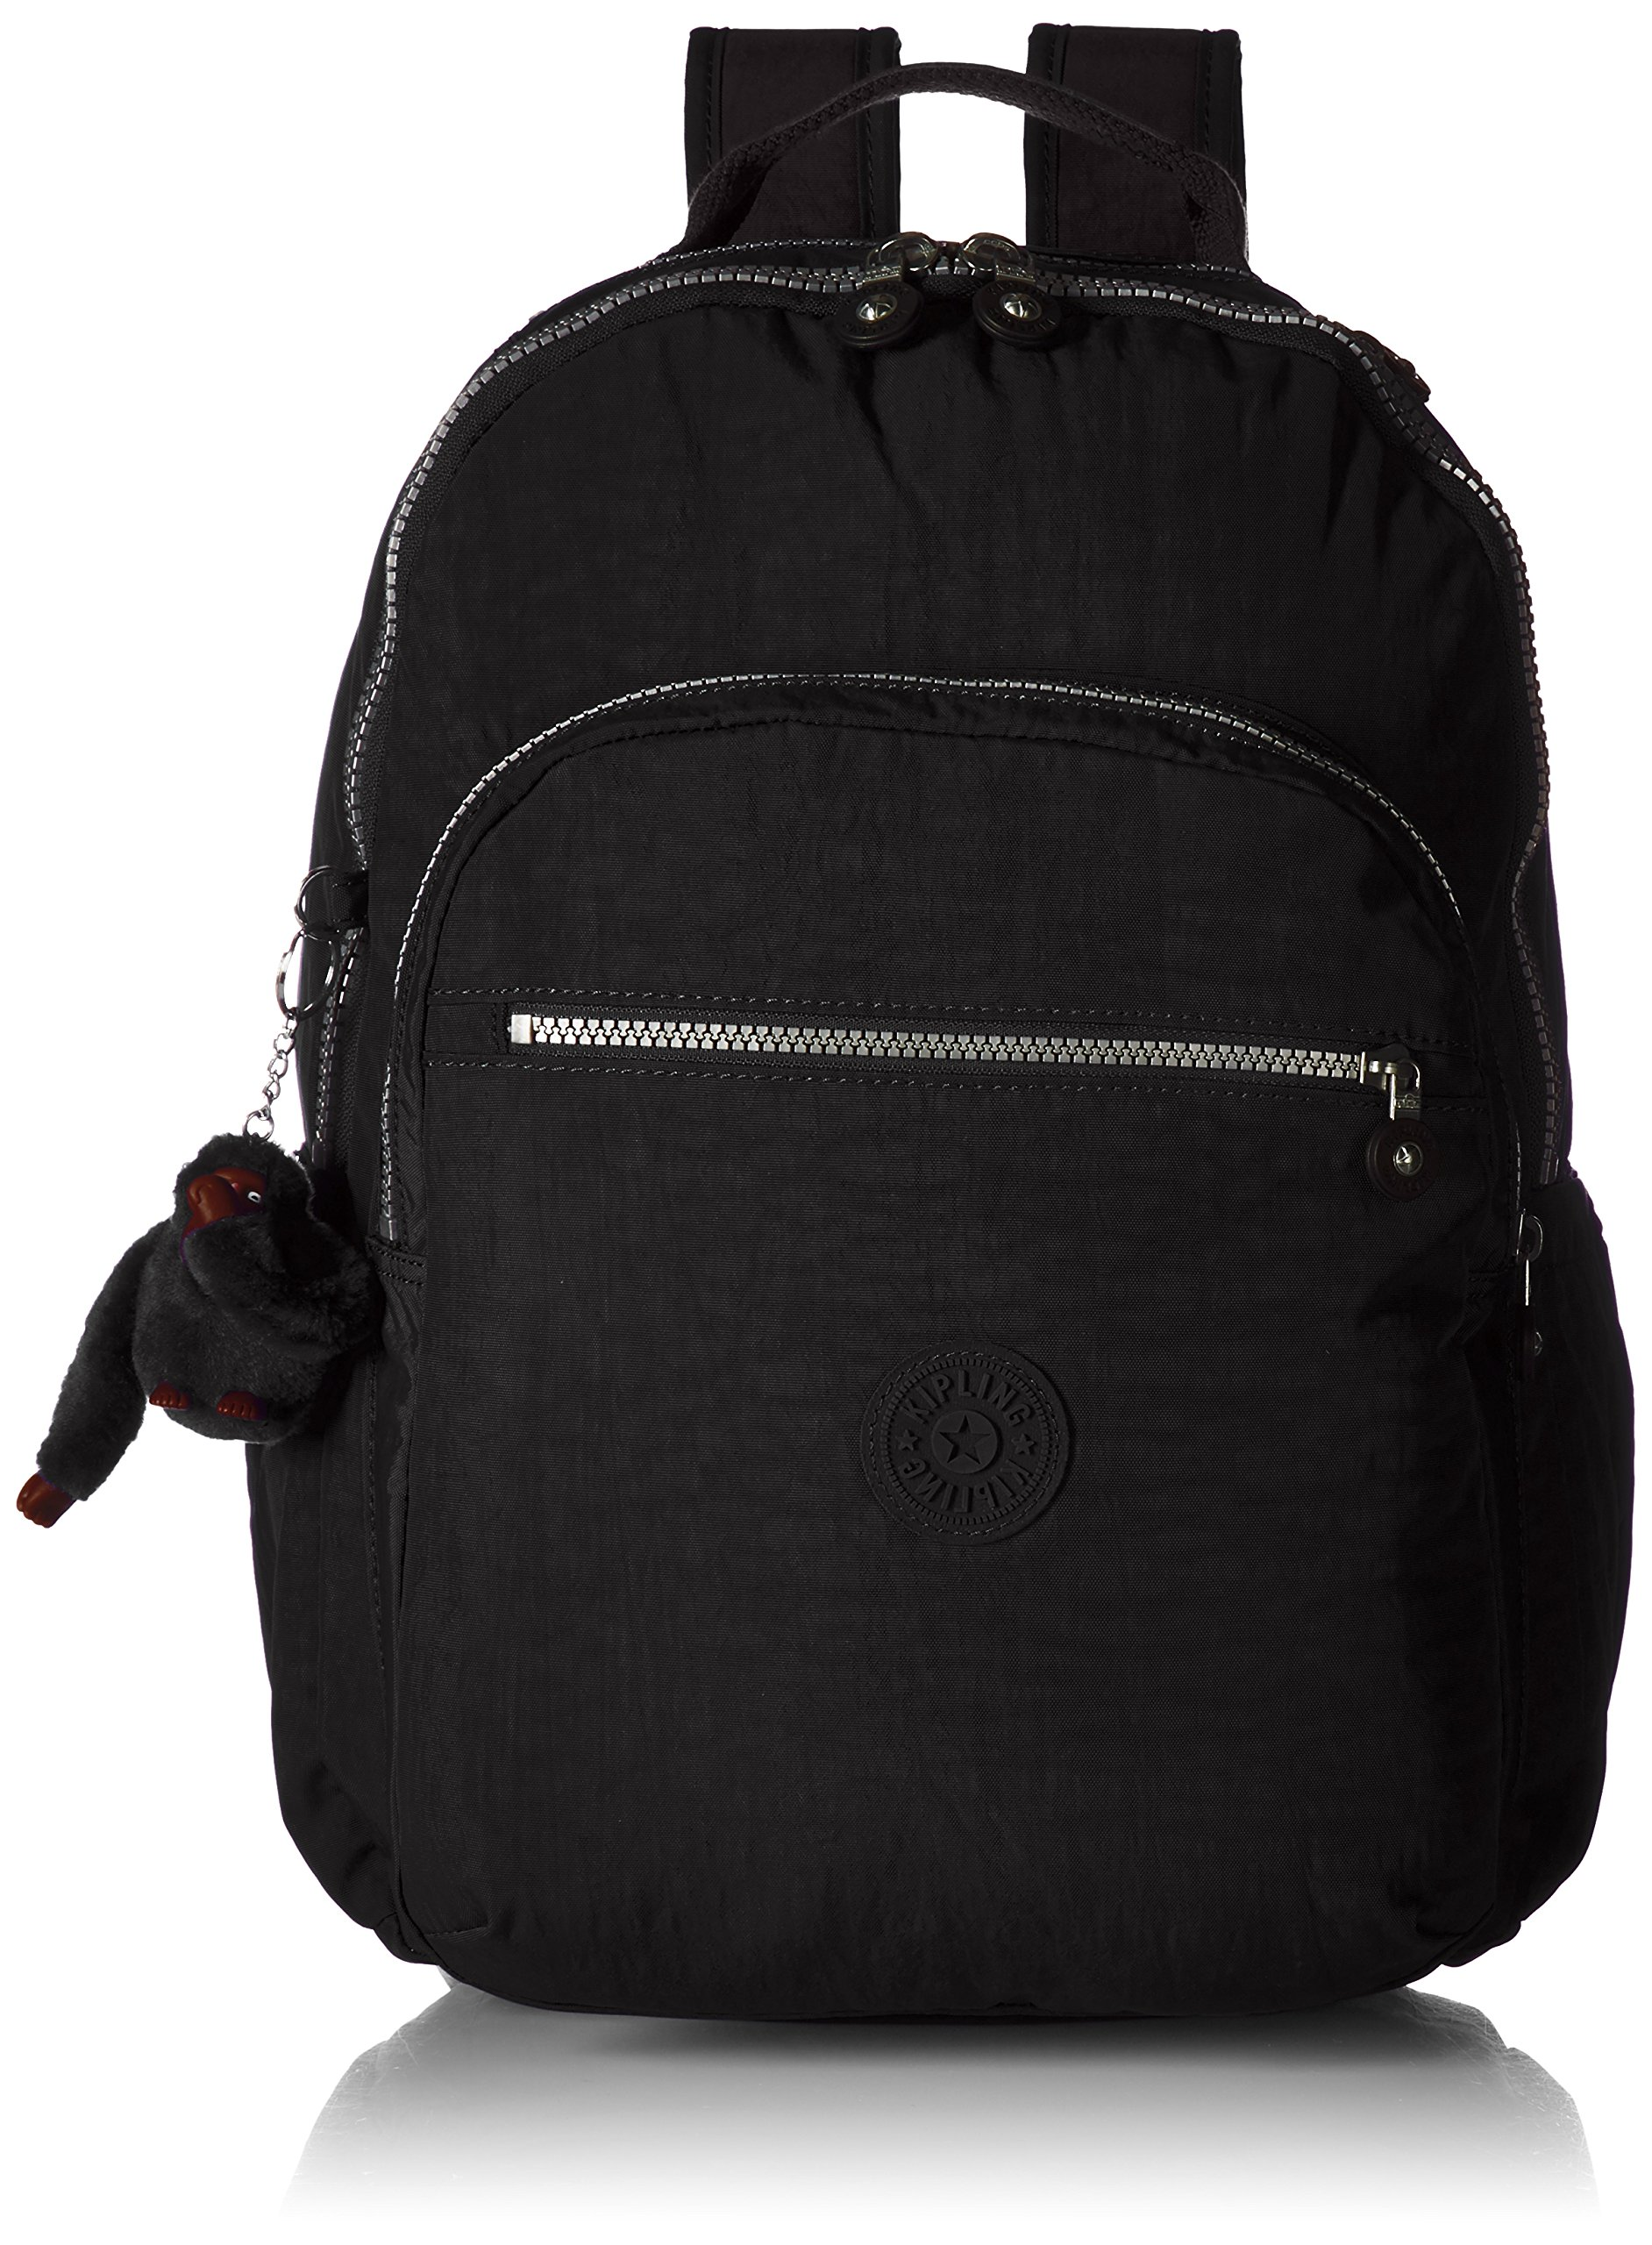 Kipling Seoul Go Black Laptop Backpack by Kipling